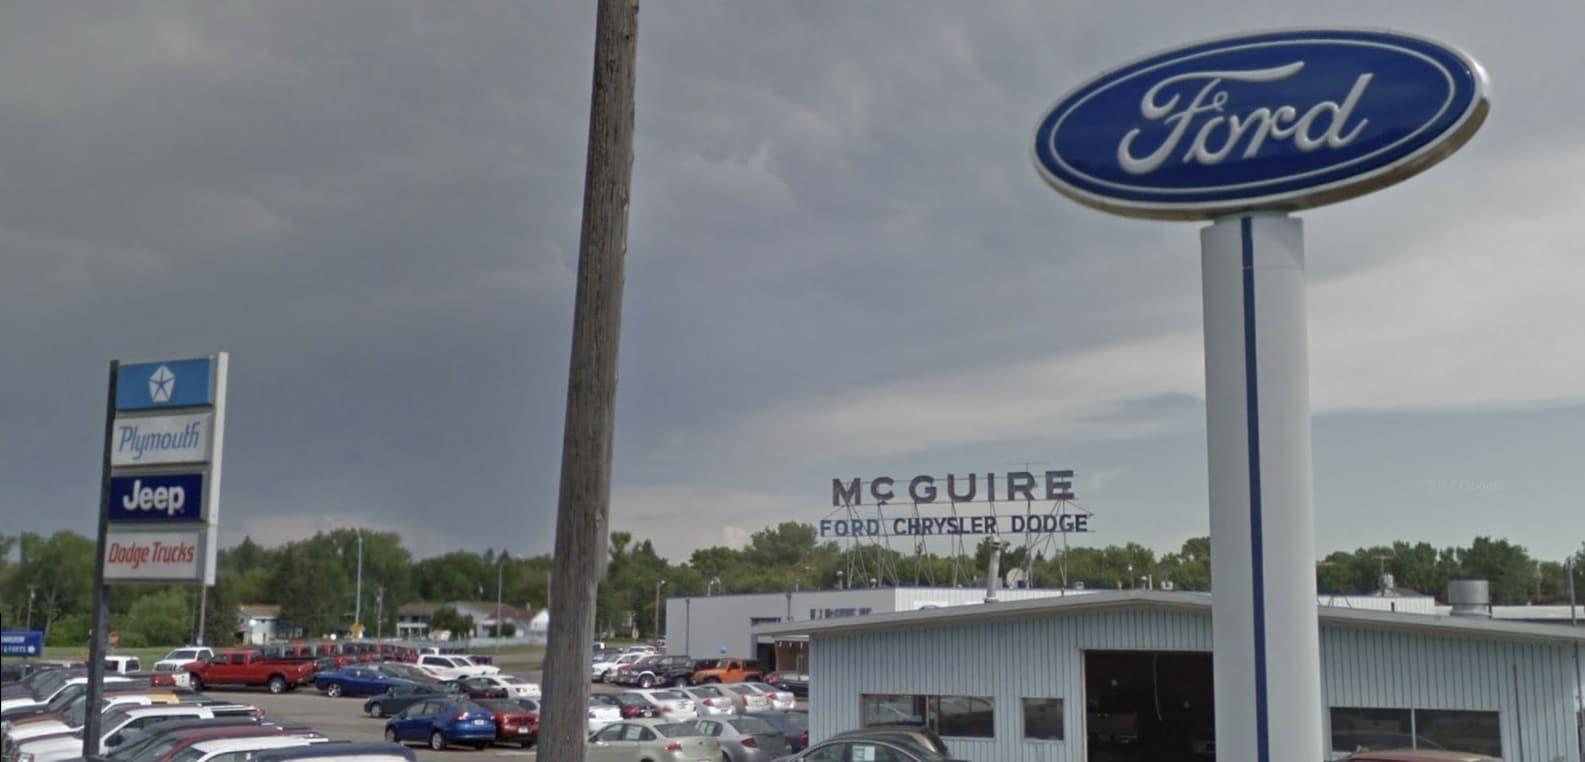 Mj Mcguire Ford Splash Dealership In